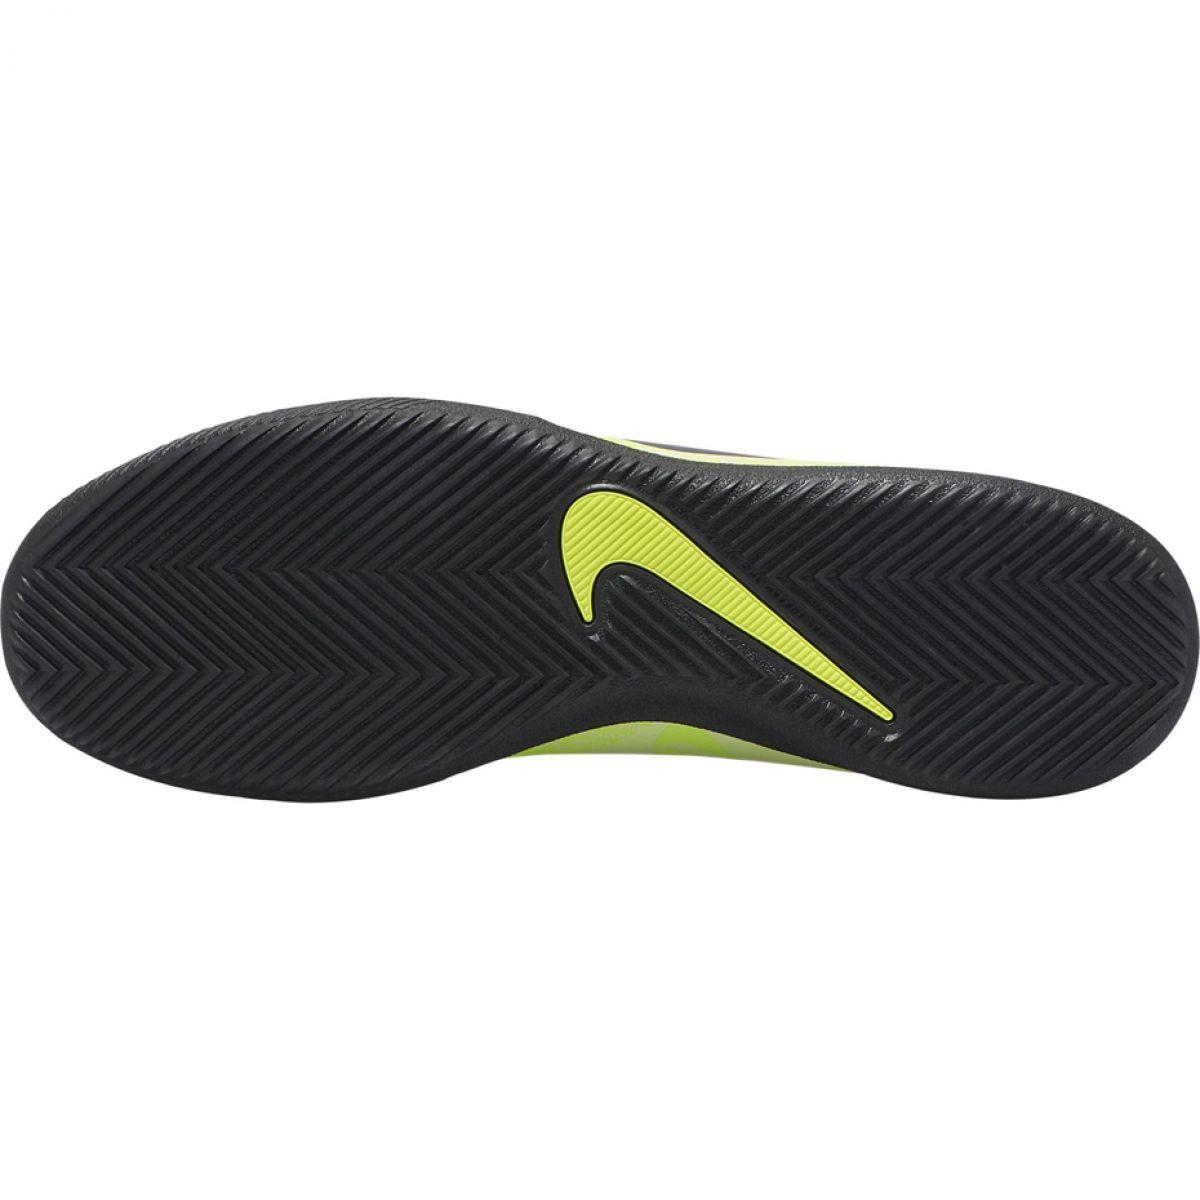 Zapatillas de interior Nike Phantom Venom Academy Ic Jr AO0372 717 amarillo amarillo